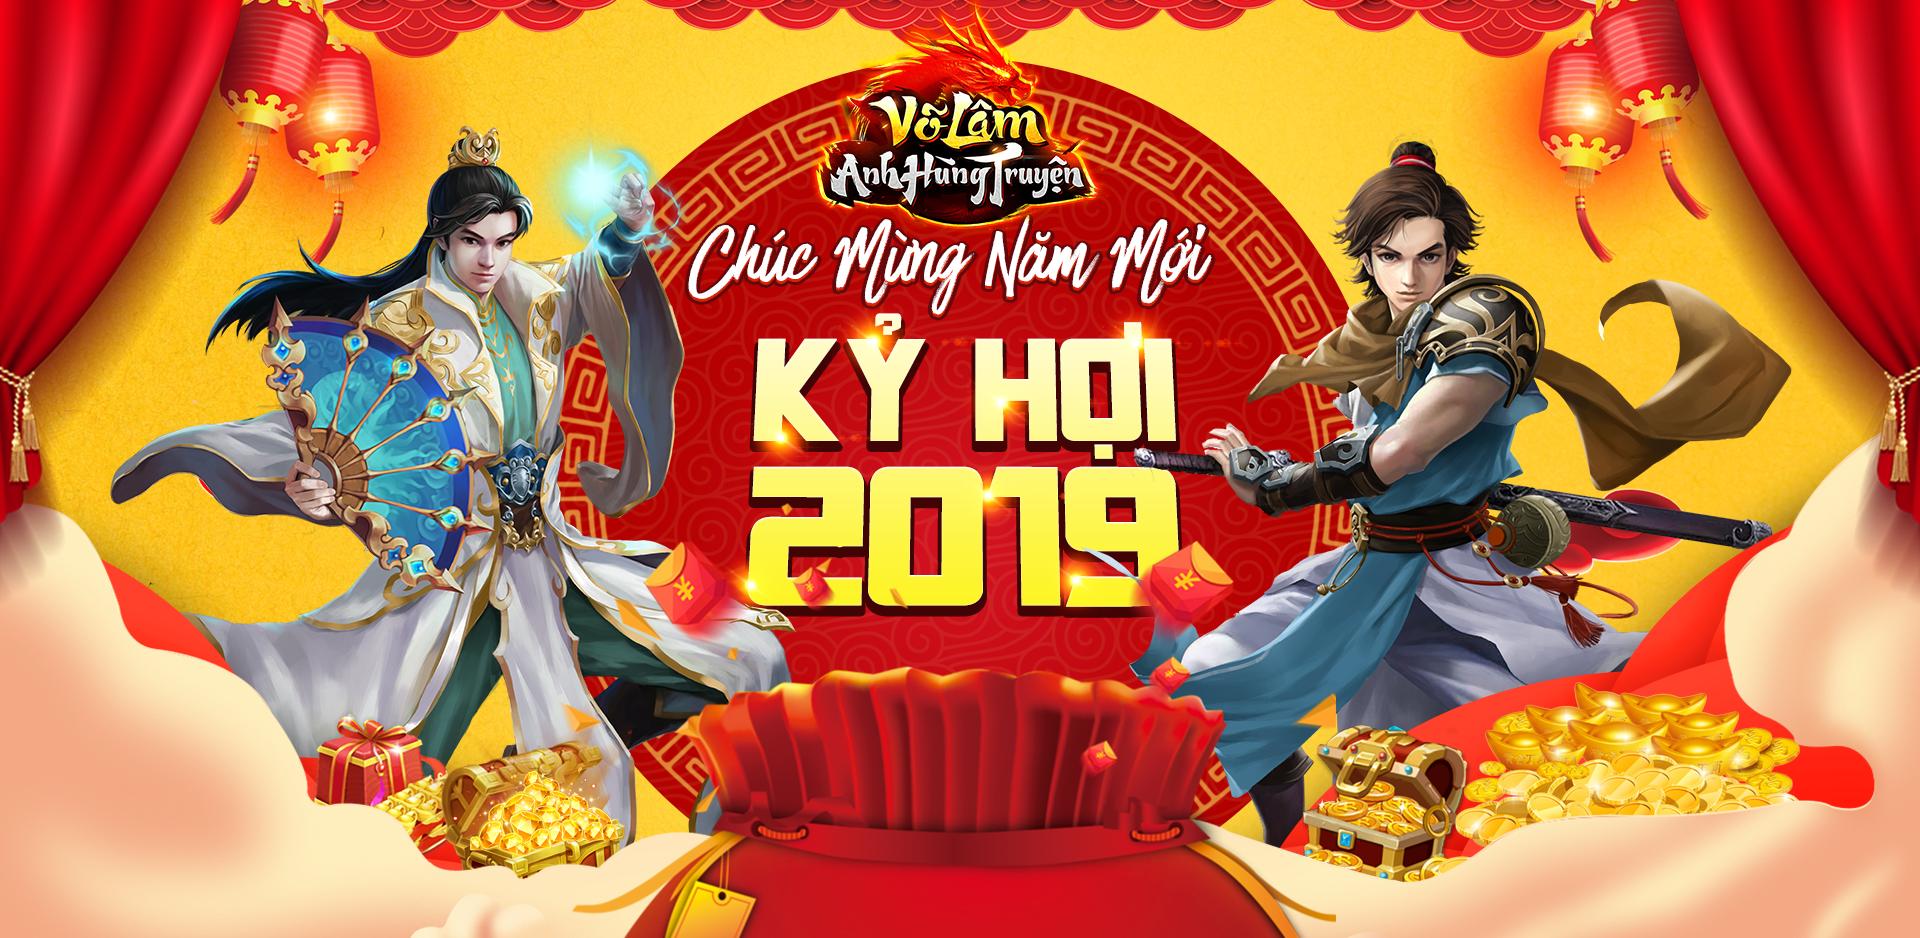 su-kien-chuoi-su-kien-mung-mung-nam-moi-2019-ky-hoi